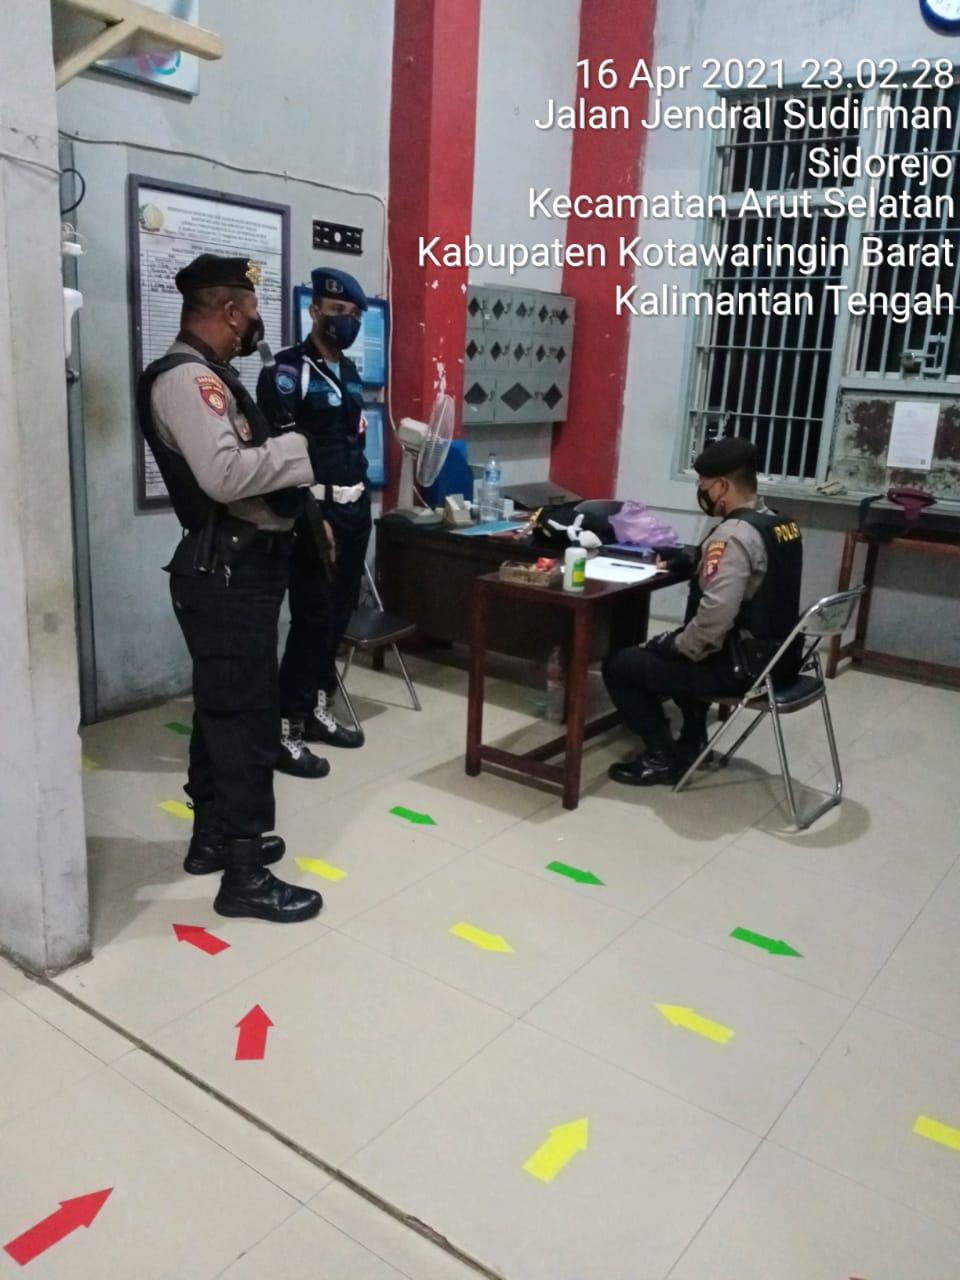 Kantor Lapas Jadi Sasaran Polisi